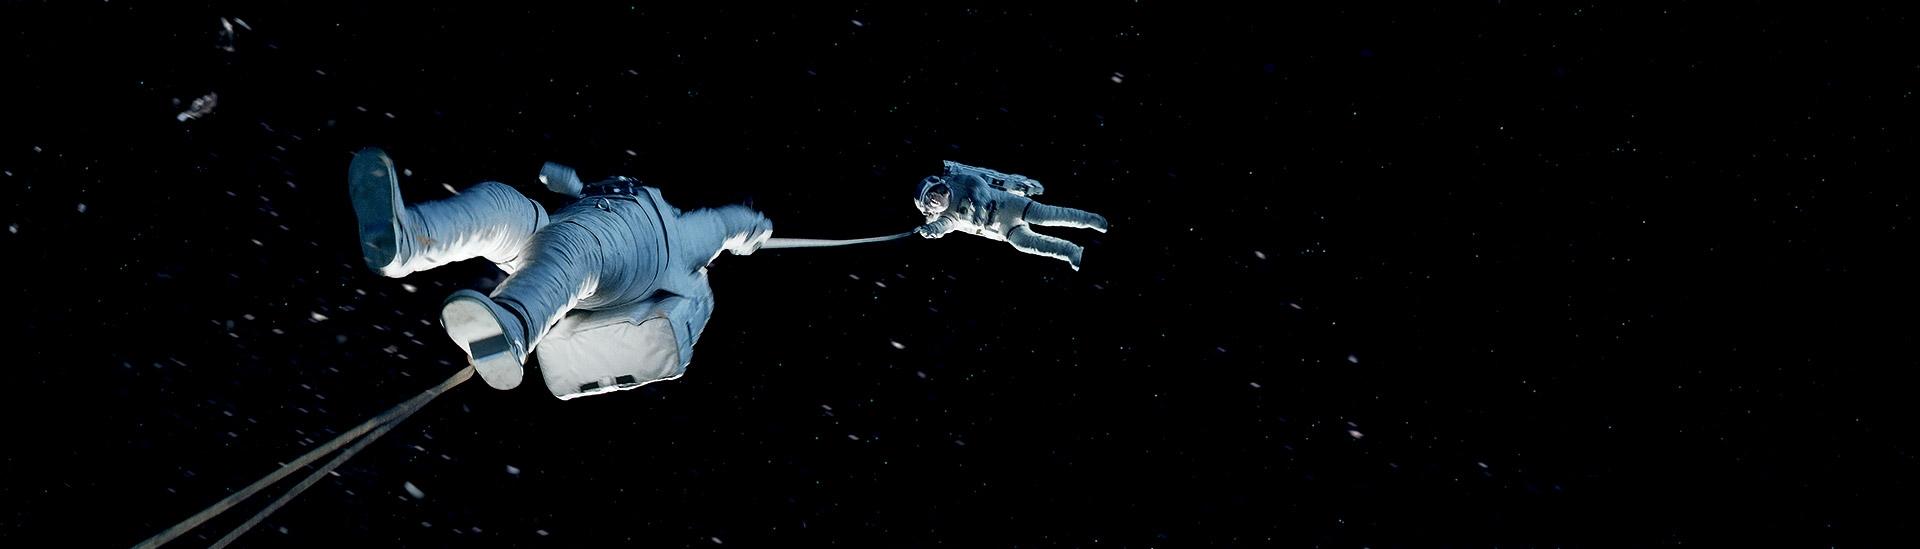 Gravity - Gravitace